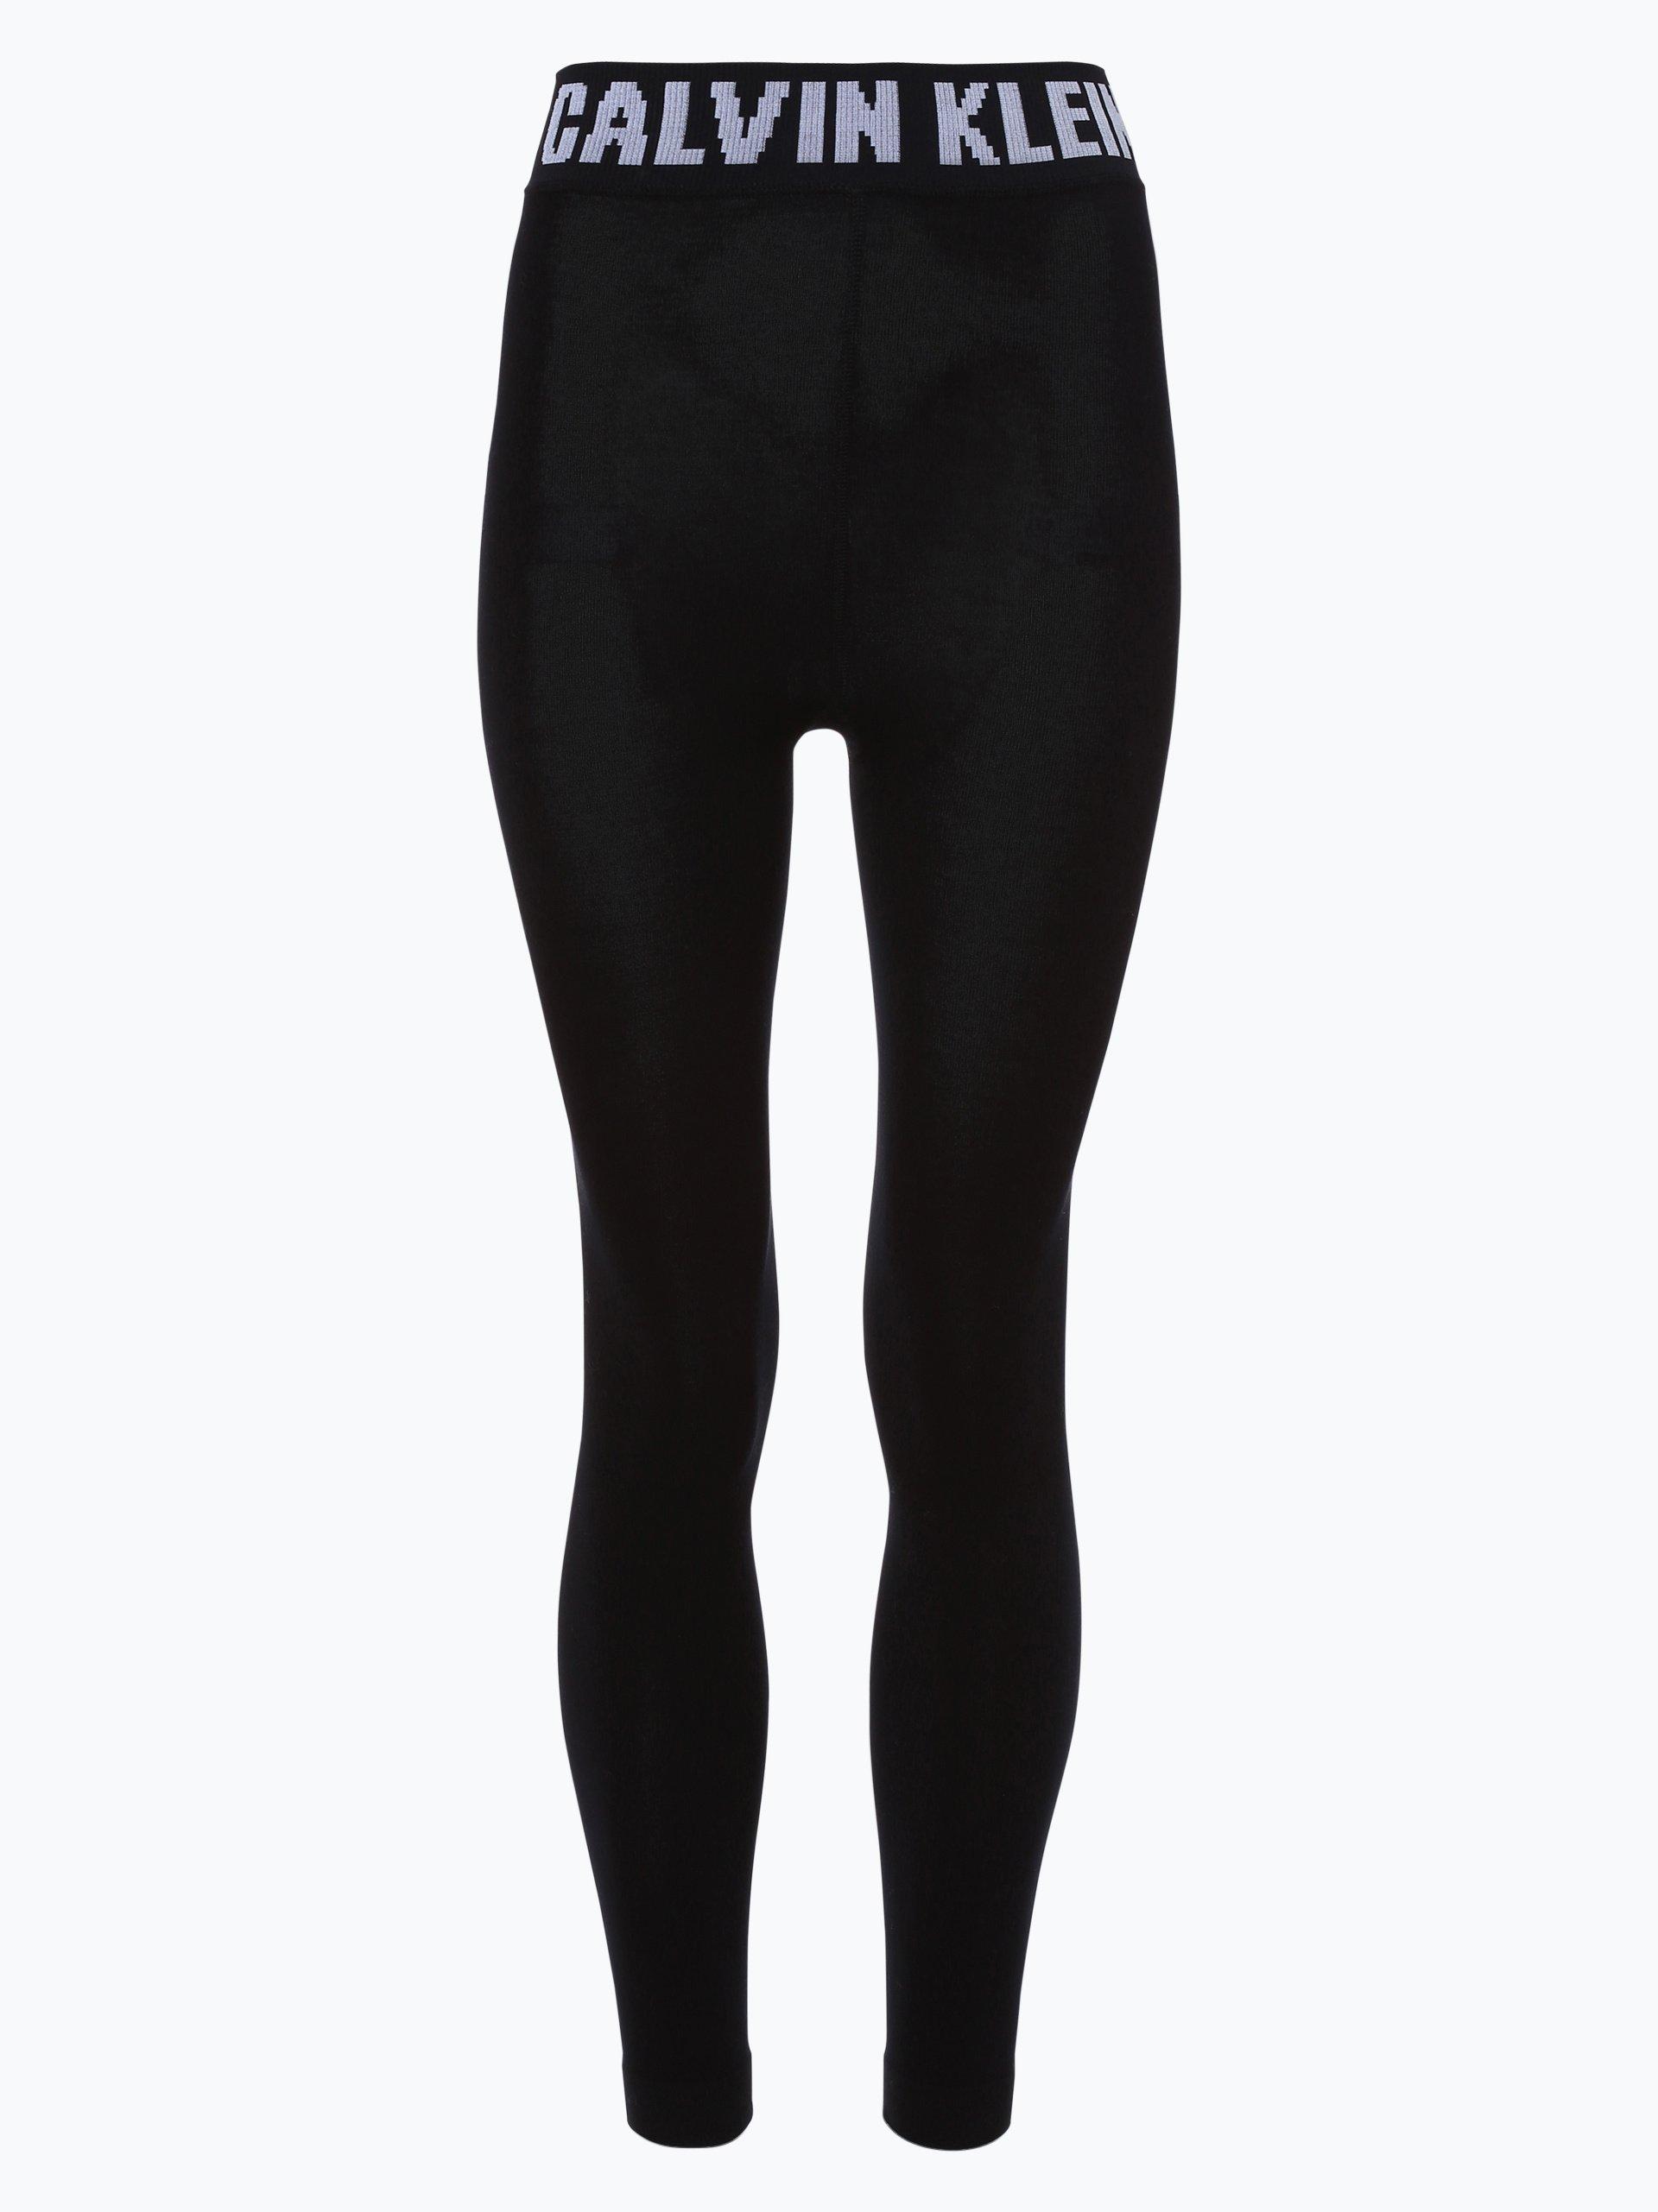 calvin klein damen leggings schwarz uni online kaufen. Black Bedroom Furniture Sets. Home Design Ideas